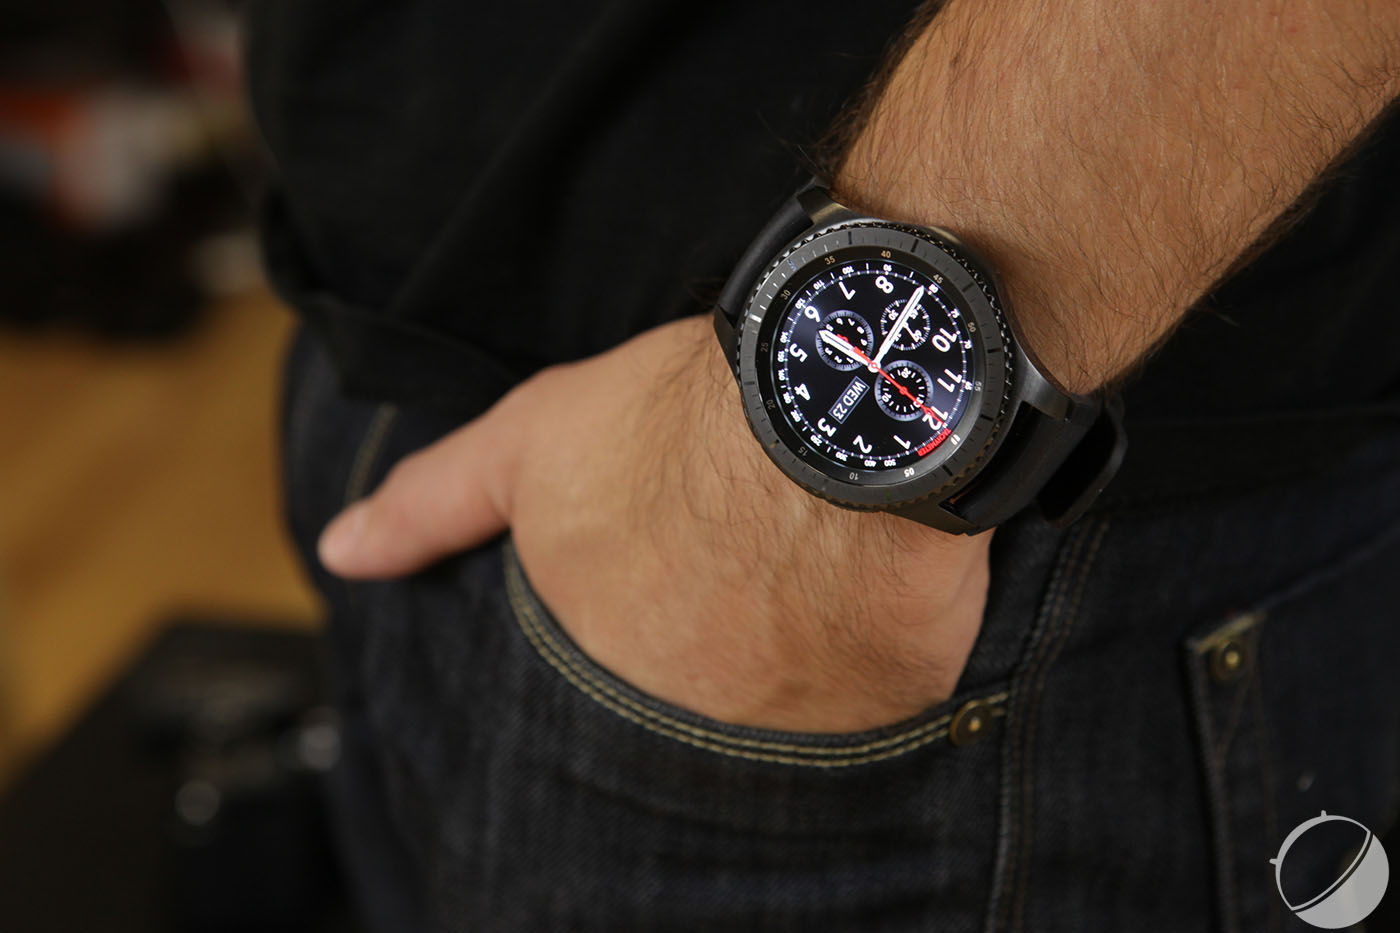 Samsung Gear S3 Frontier La Meilleure Montre Gps: Test Samsung Gear S3 : Notre Avis Complet